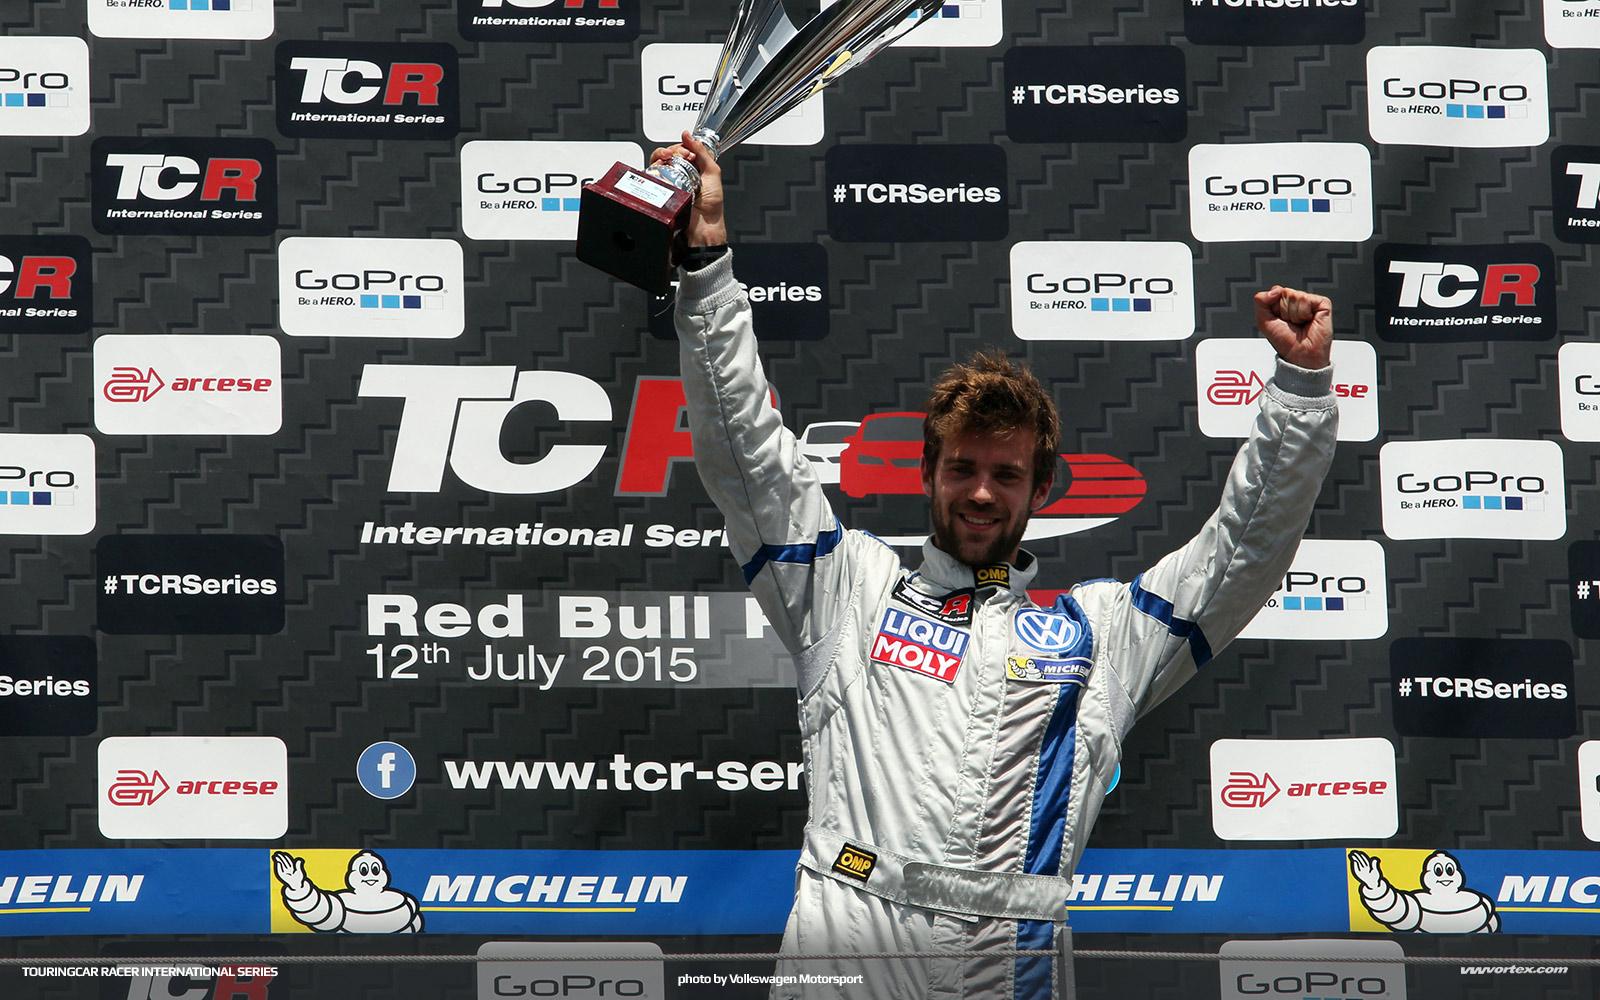 TCR-inter